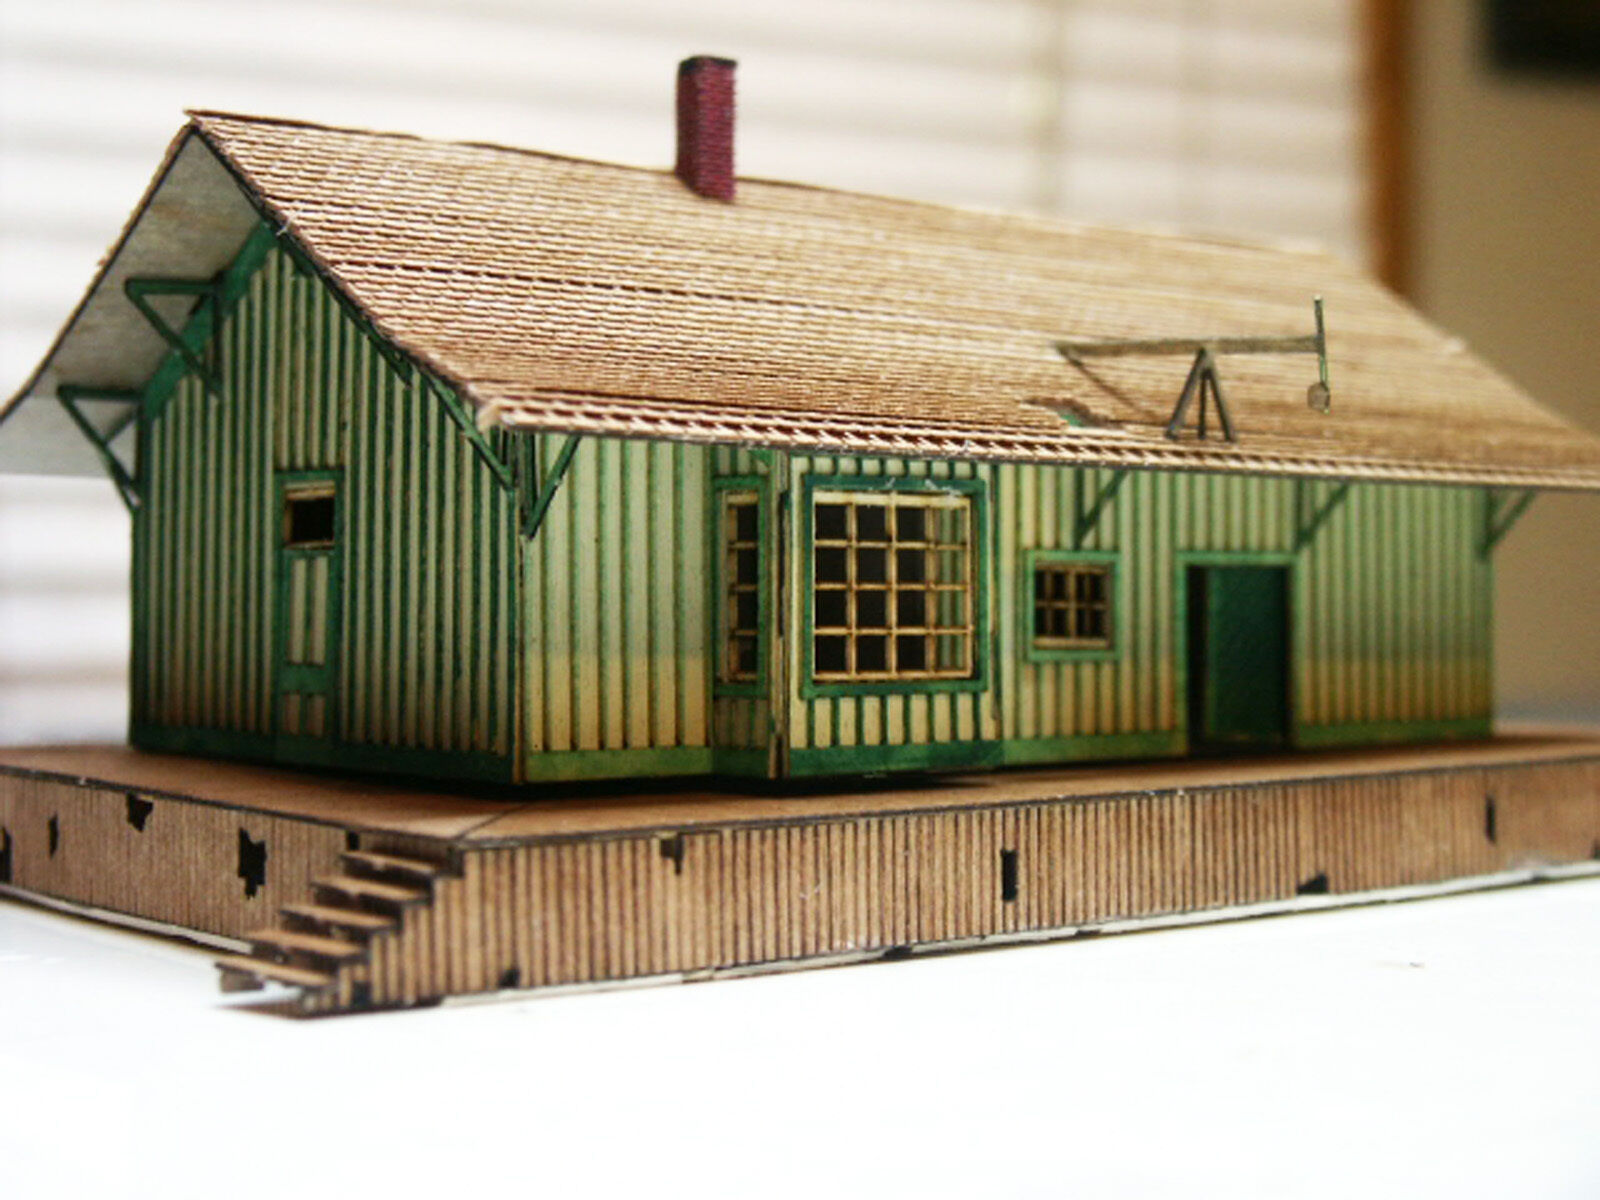 CHELTENHAM STATION N Scale Model Railroad Structure Unptd Wood Laser Kit RSL3024